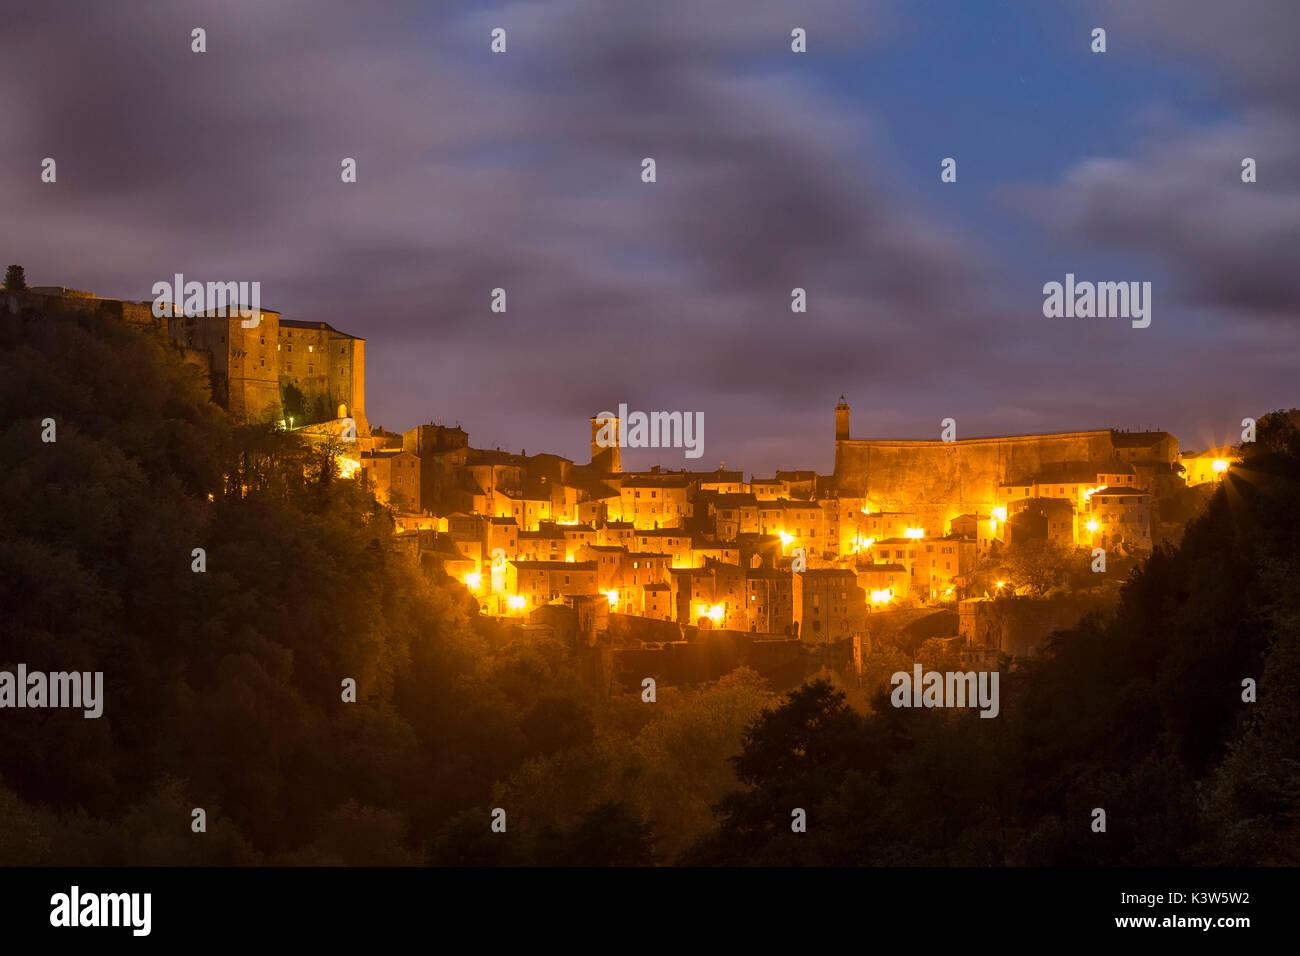 Village of Sorano at night.Sorano, Grosseto province, Tuscany, Italy, Europe - Stock Image